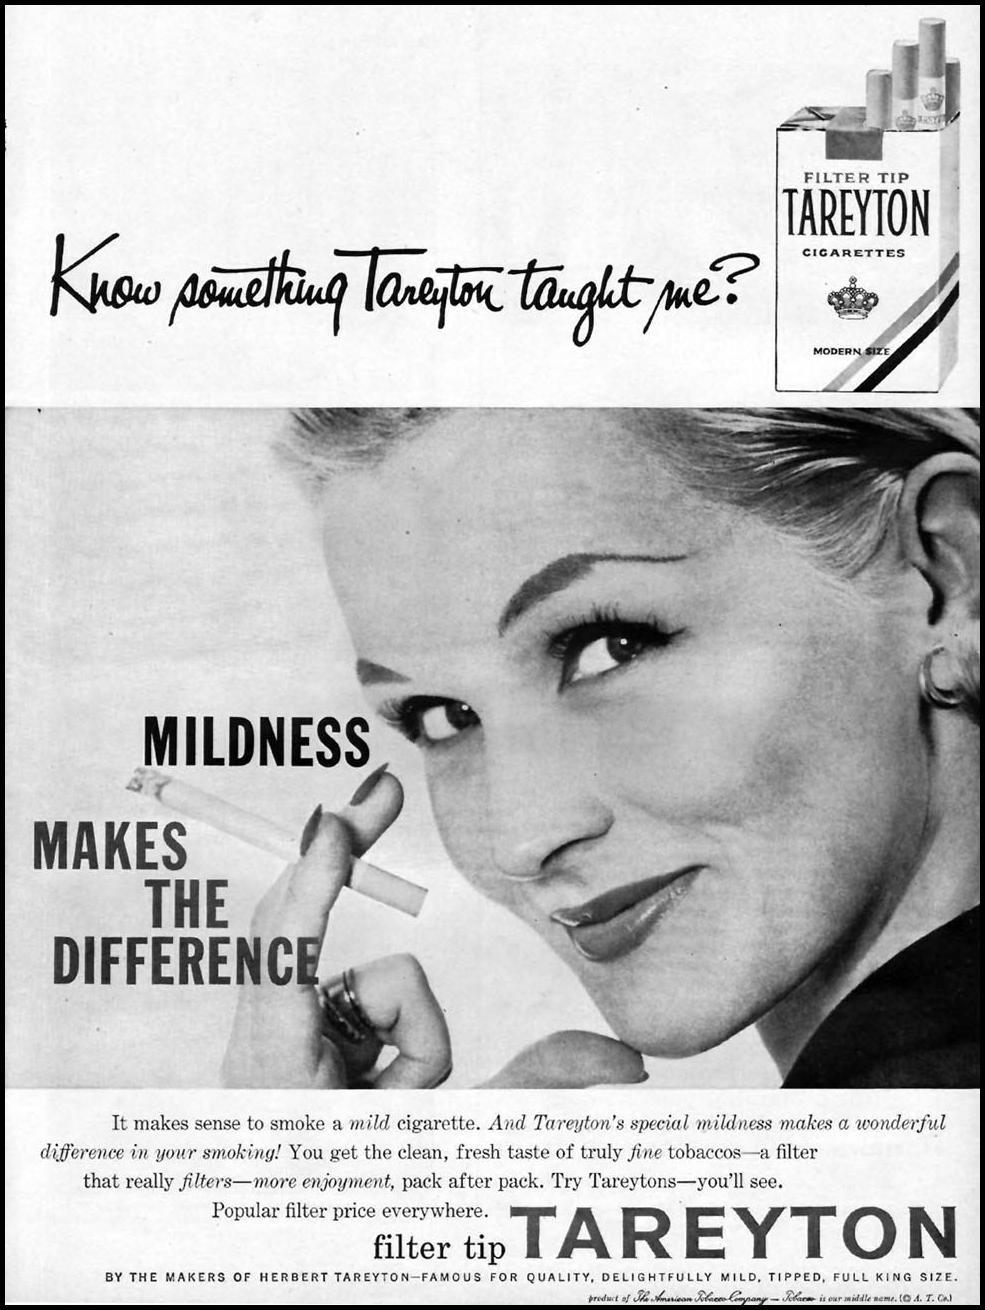 TAREYTON CIGARETTES LIFE 09/09/1957 p. 51